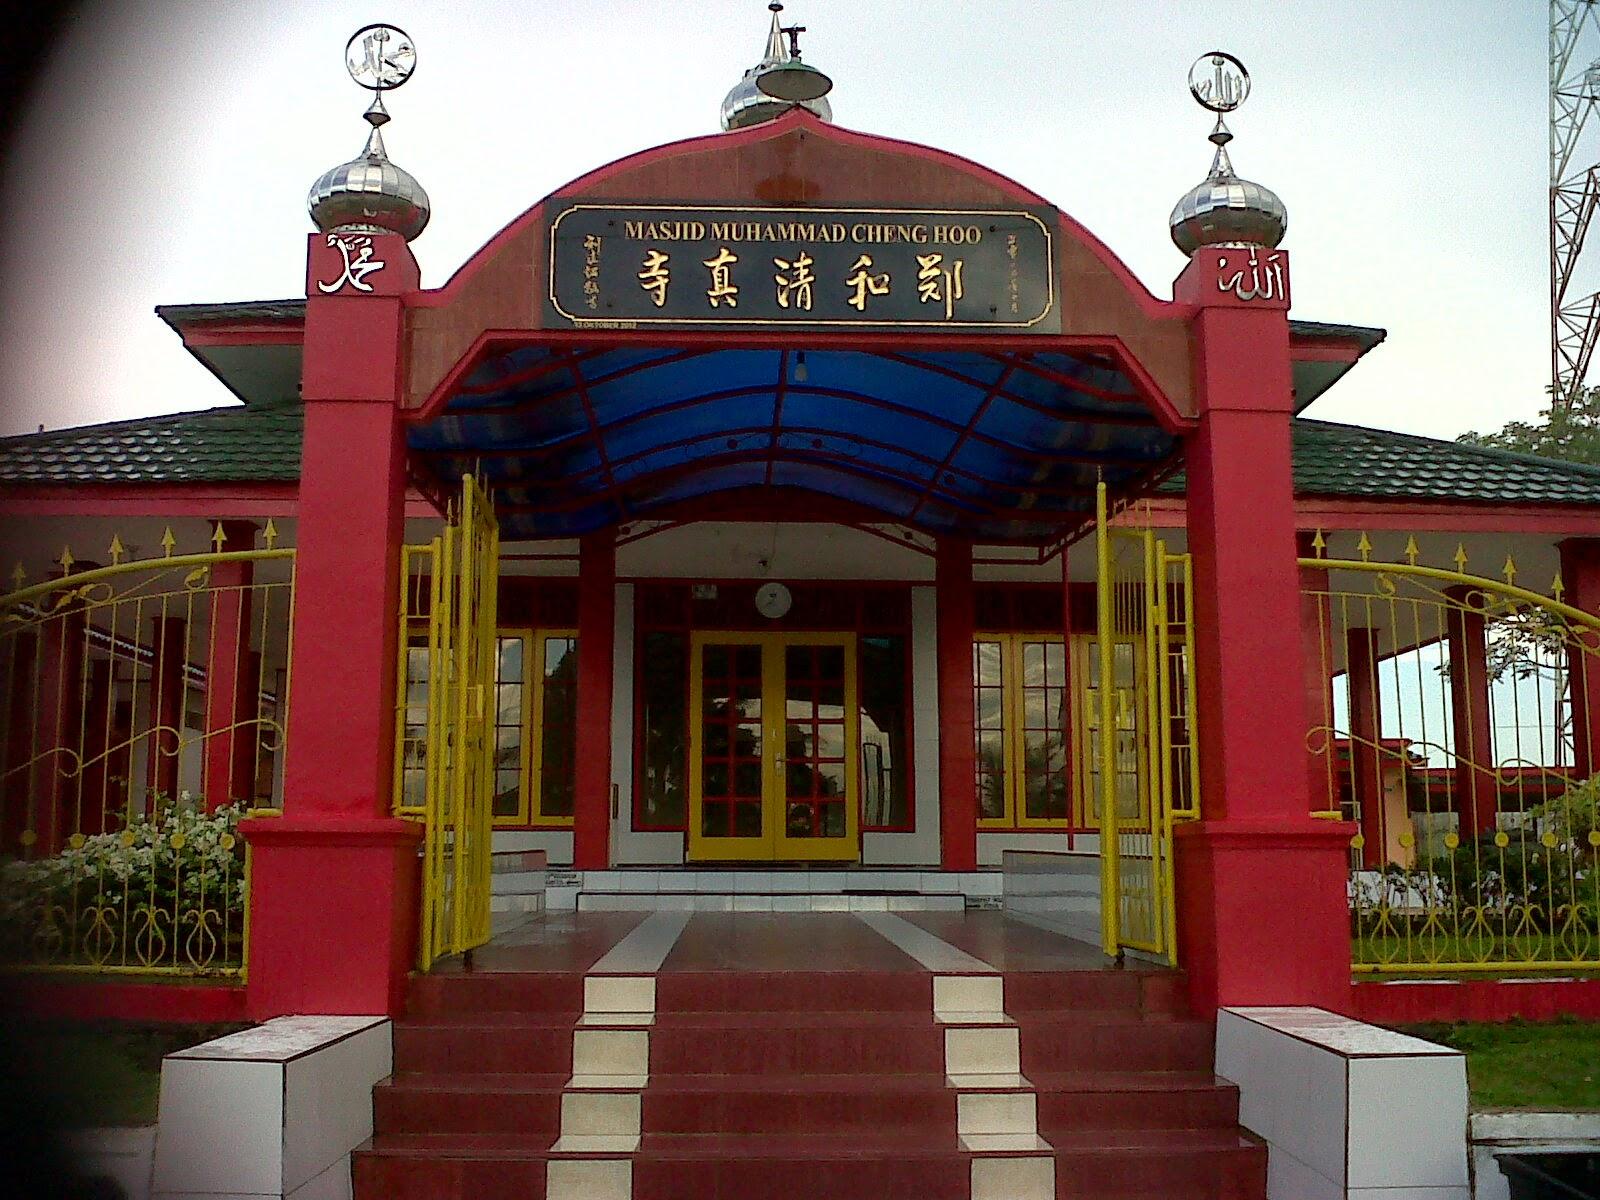 Bangunan Masjid Chengho ini tidak terlalu besar Masjid dibangun dilahan yang cukup luas terletak di Desa Batuah Kelurahan Loa Janan Kabupaten Kutai Karta